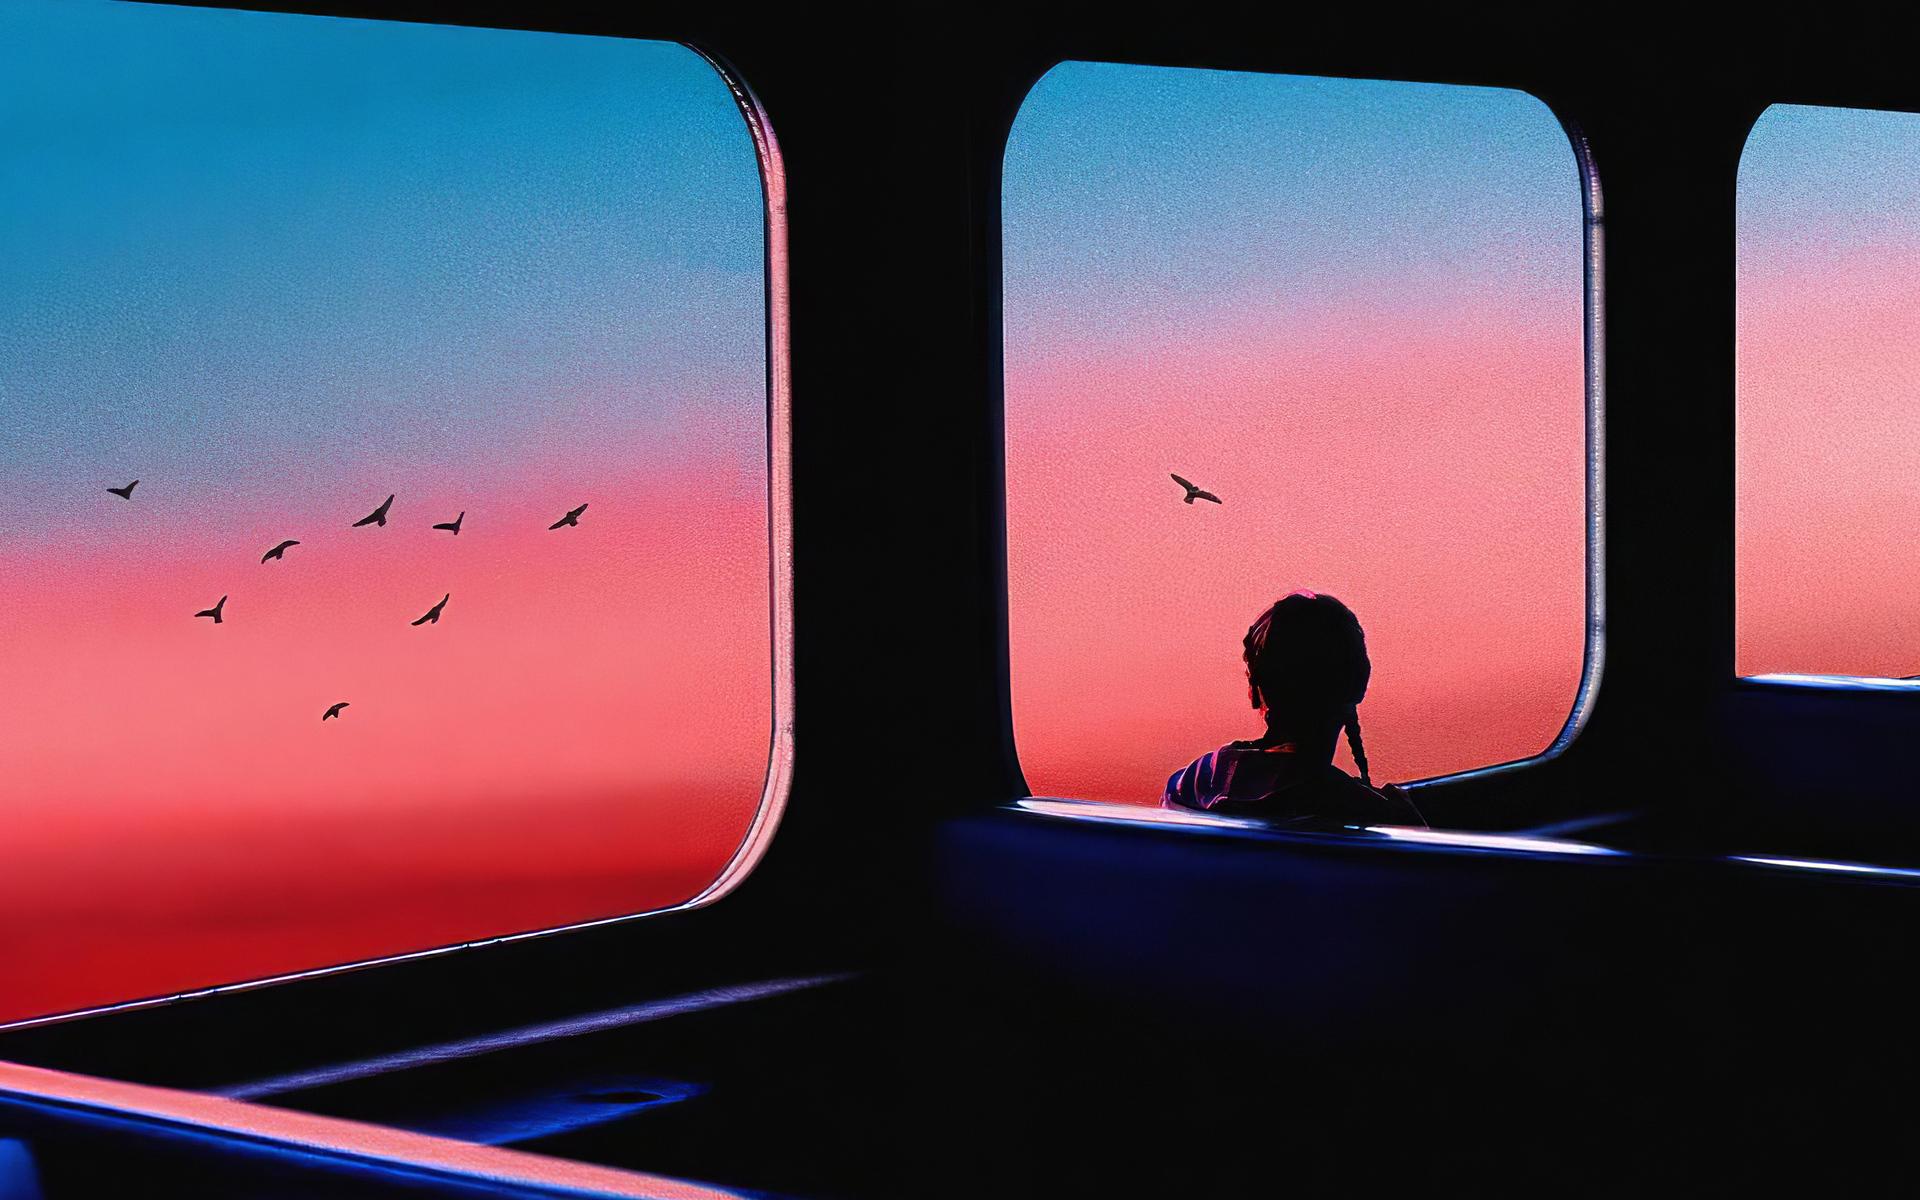 bus-journey-scenery-4k-lv.jpg